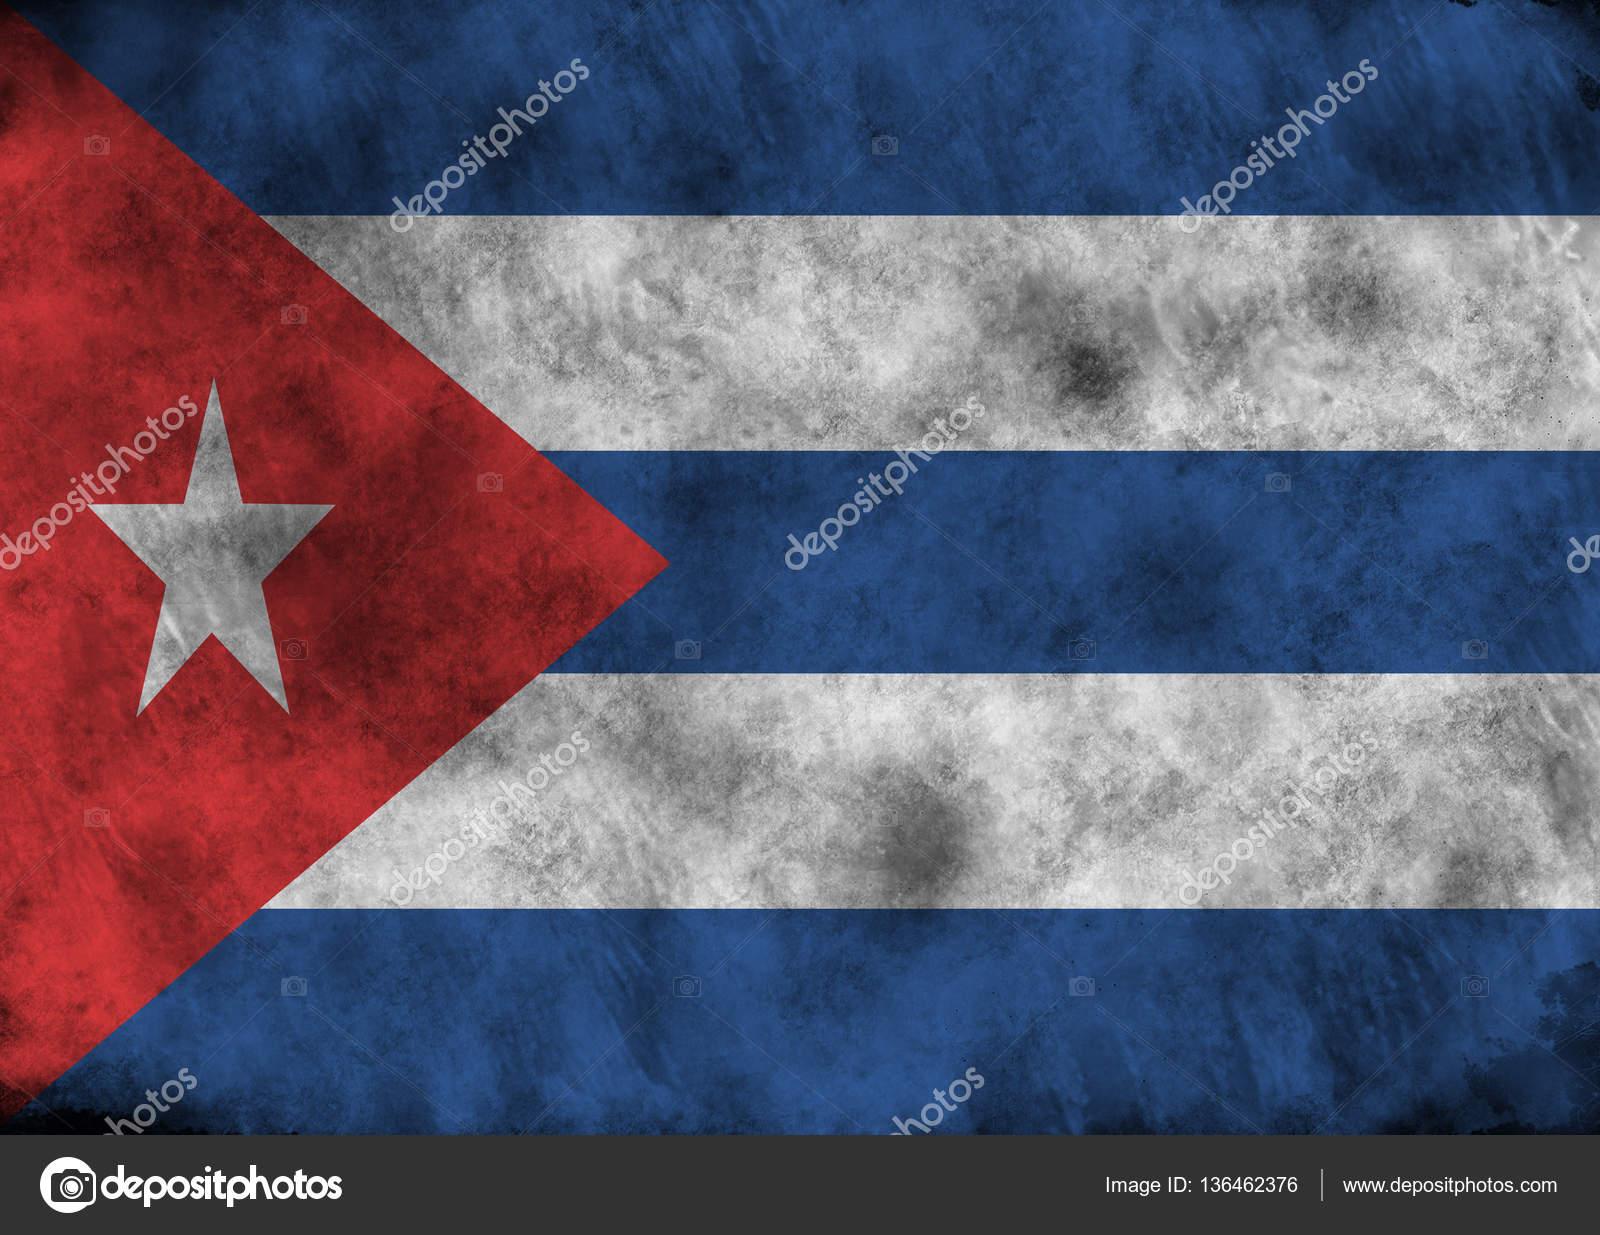 Grunge Cuba flag. — Stock Photo © firea #136462376